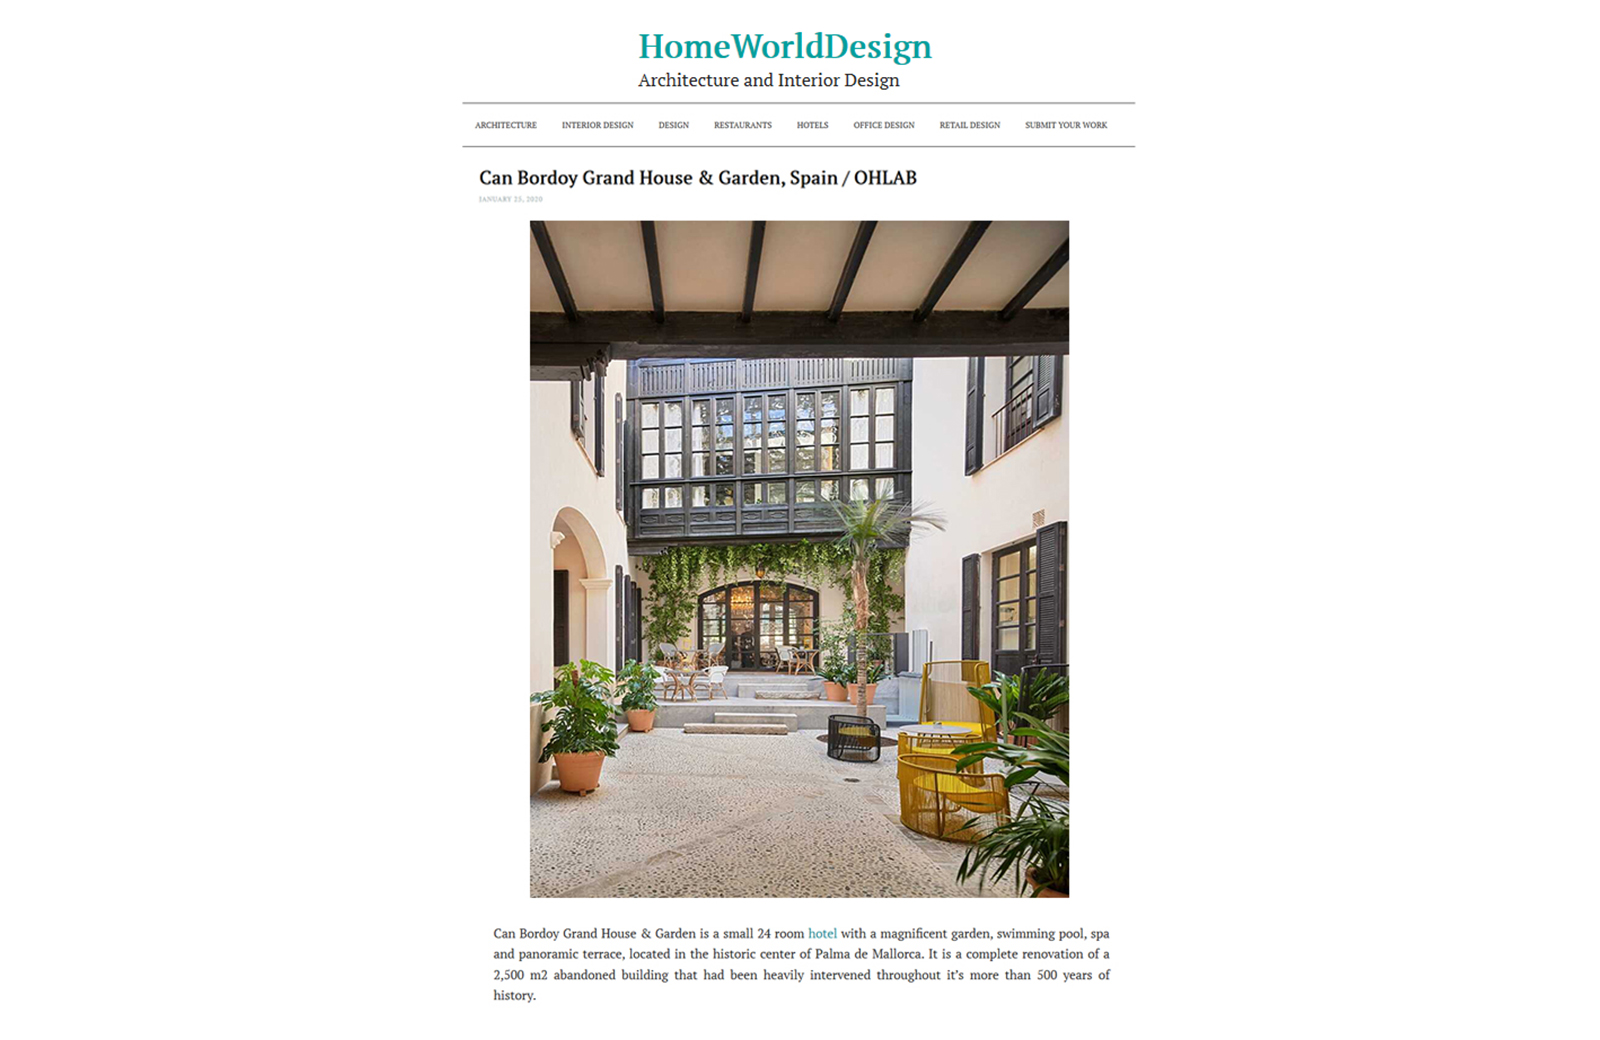 200127_homeworlddesign_canbordoy-1600x1040